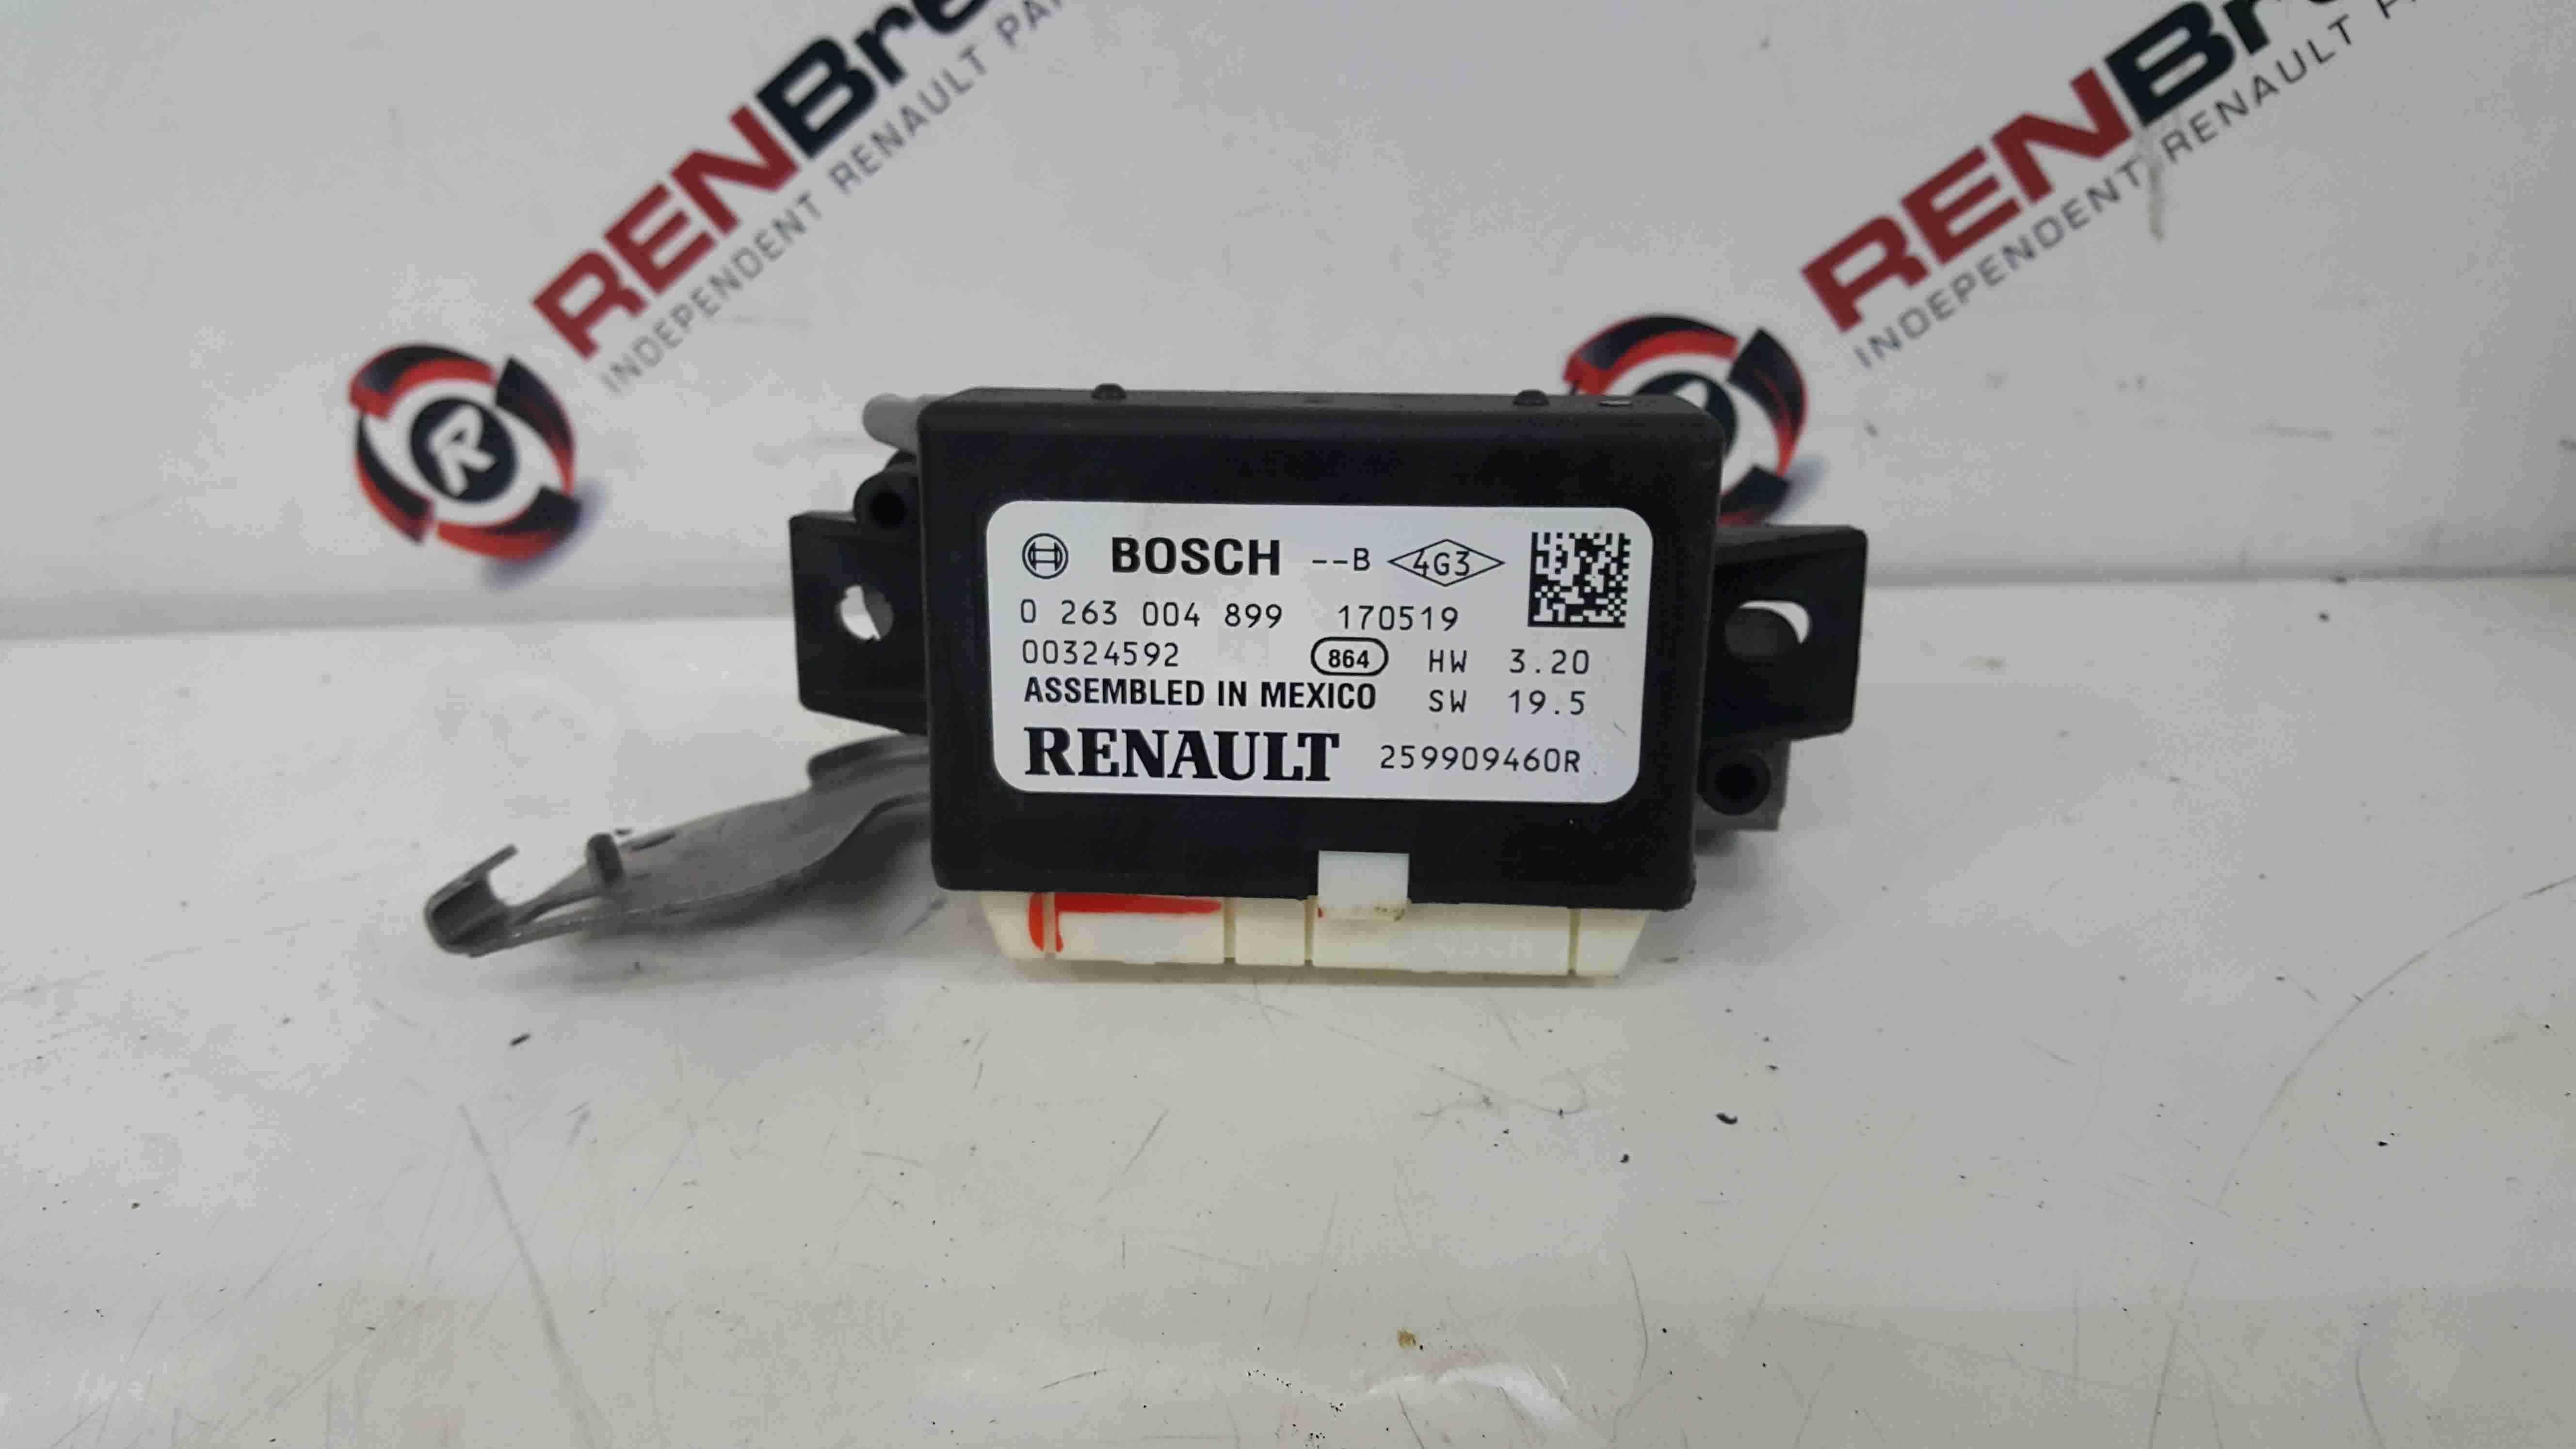 Renault Kadjar 2015-2018 Parking Sensor Module 259909460R